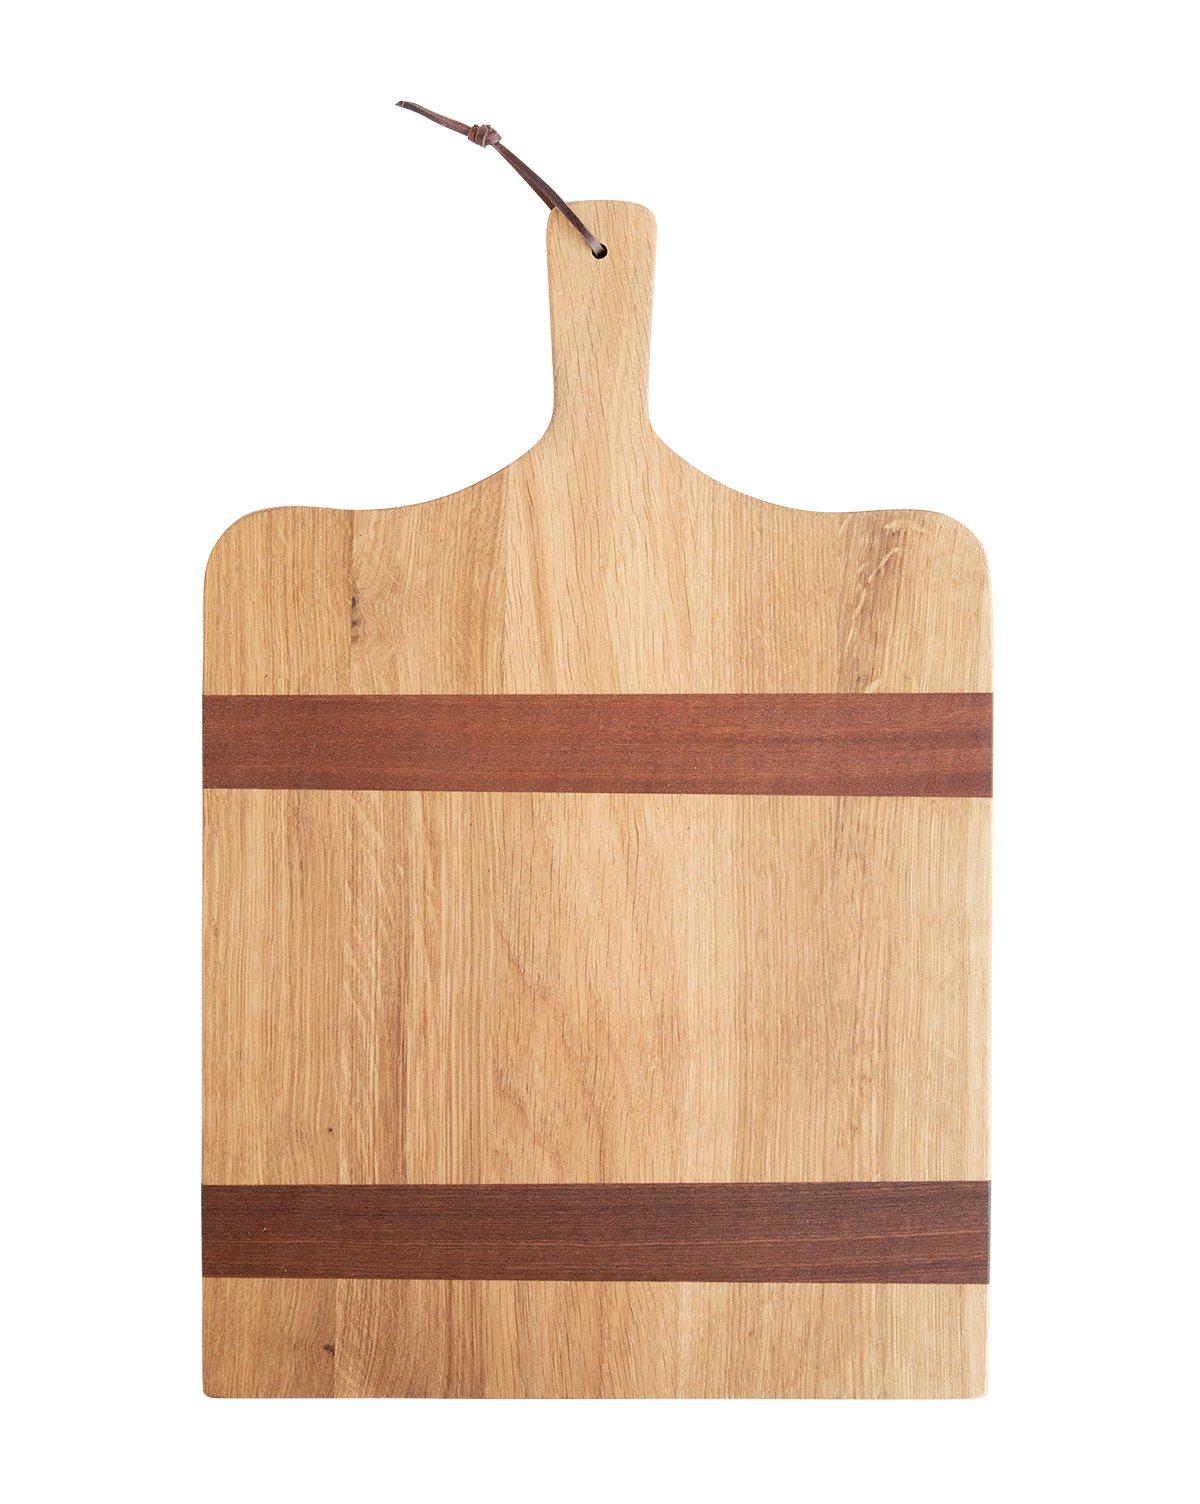 Somerset_Bread_Boards_5.jpg